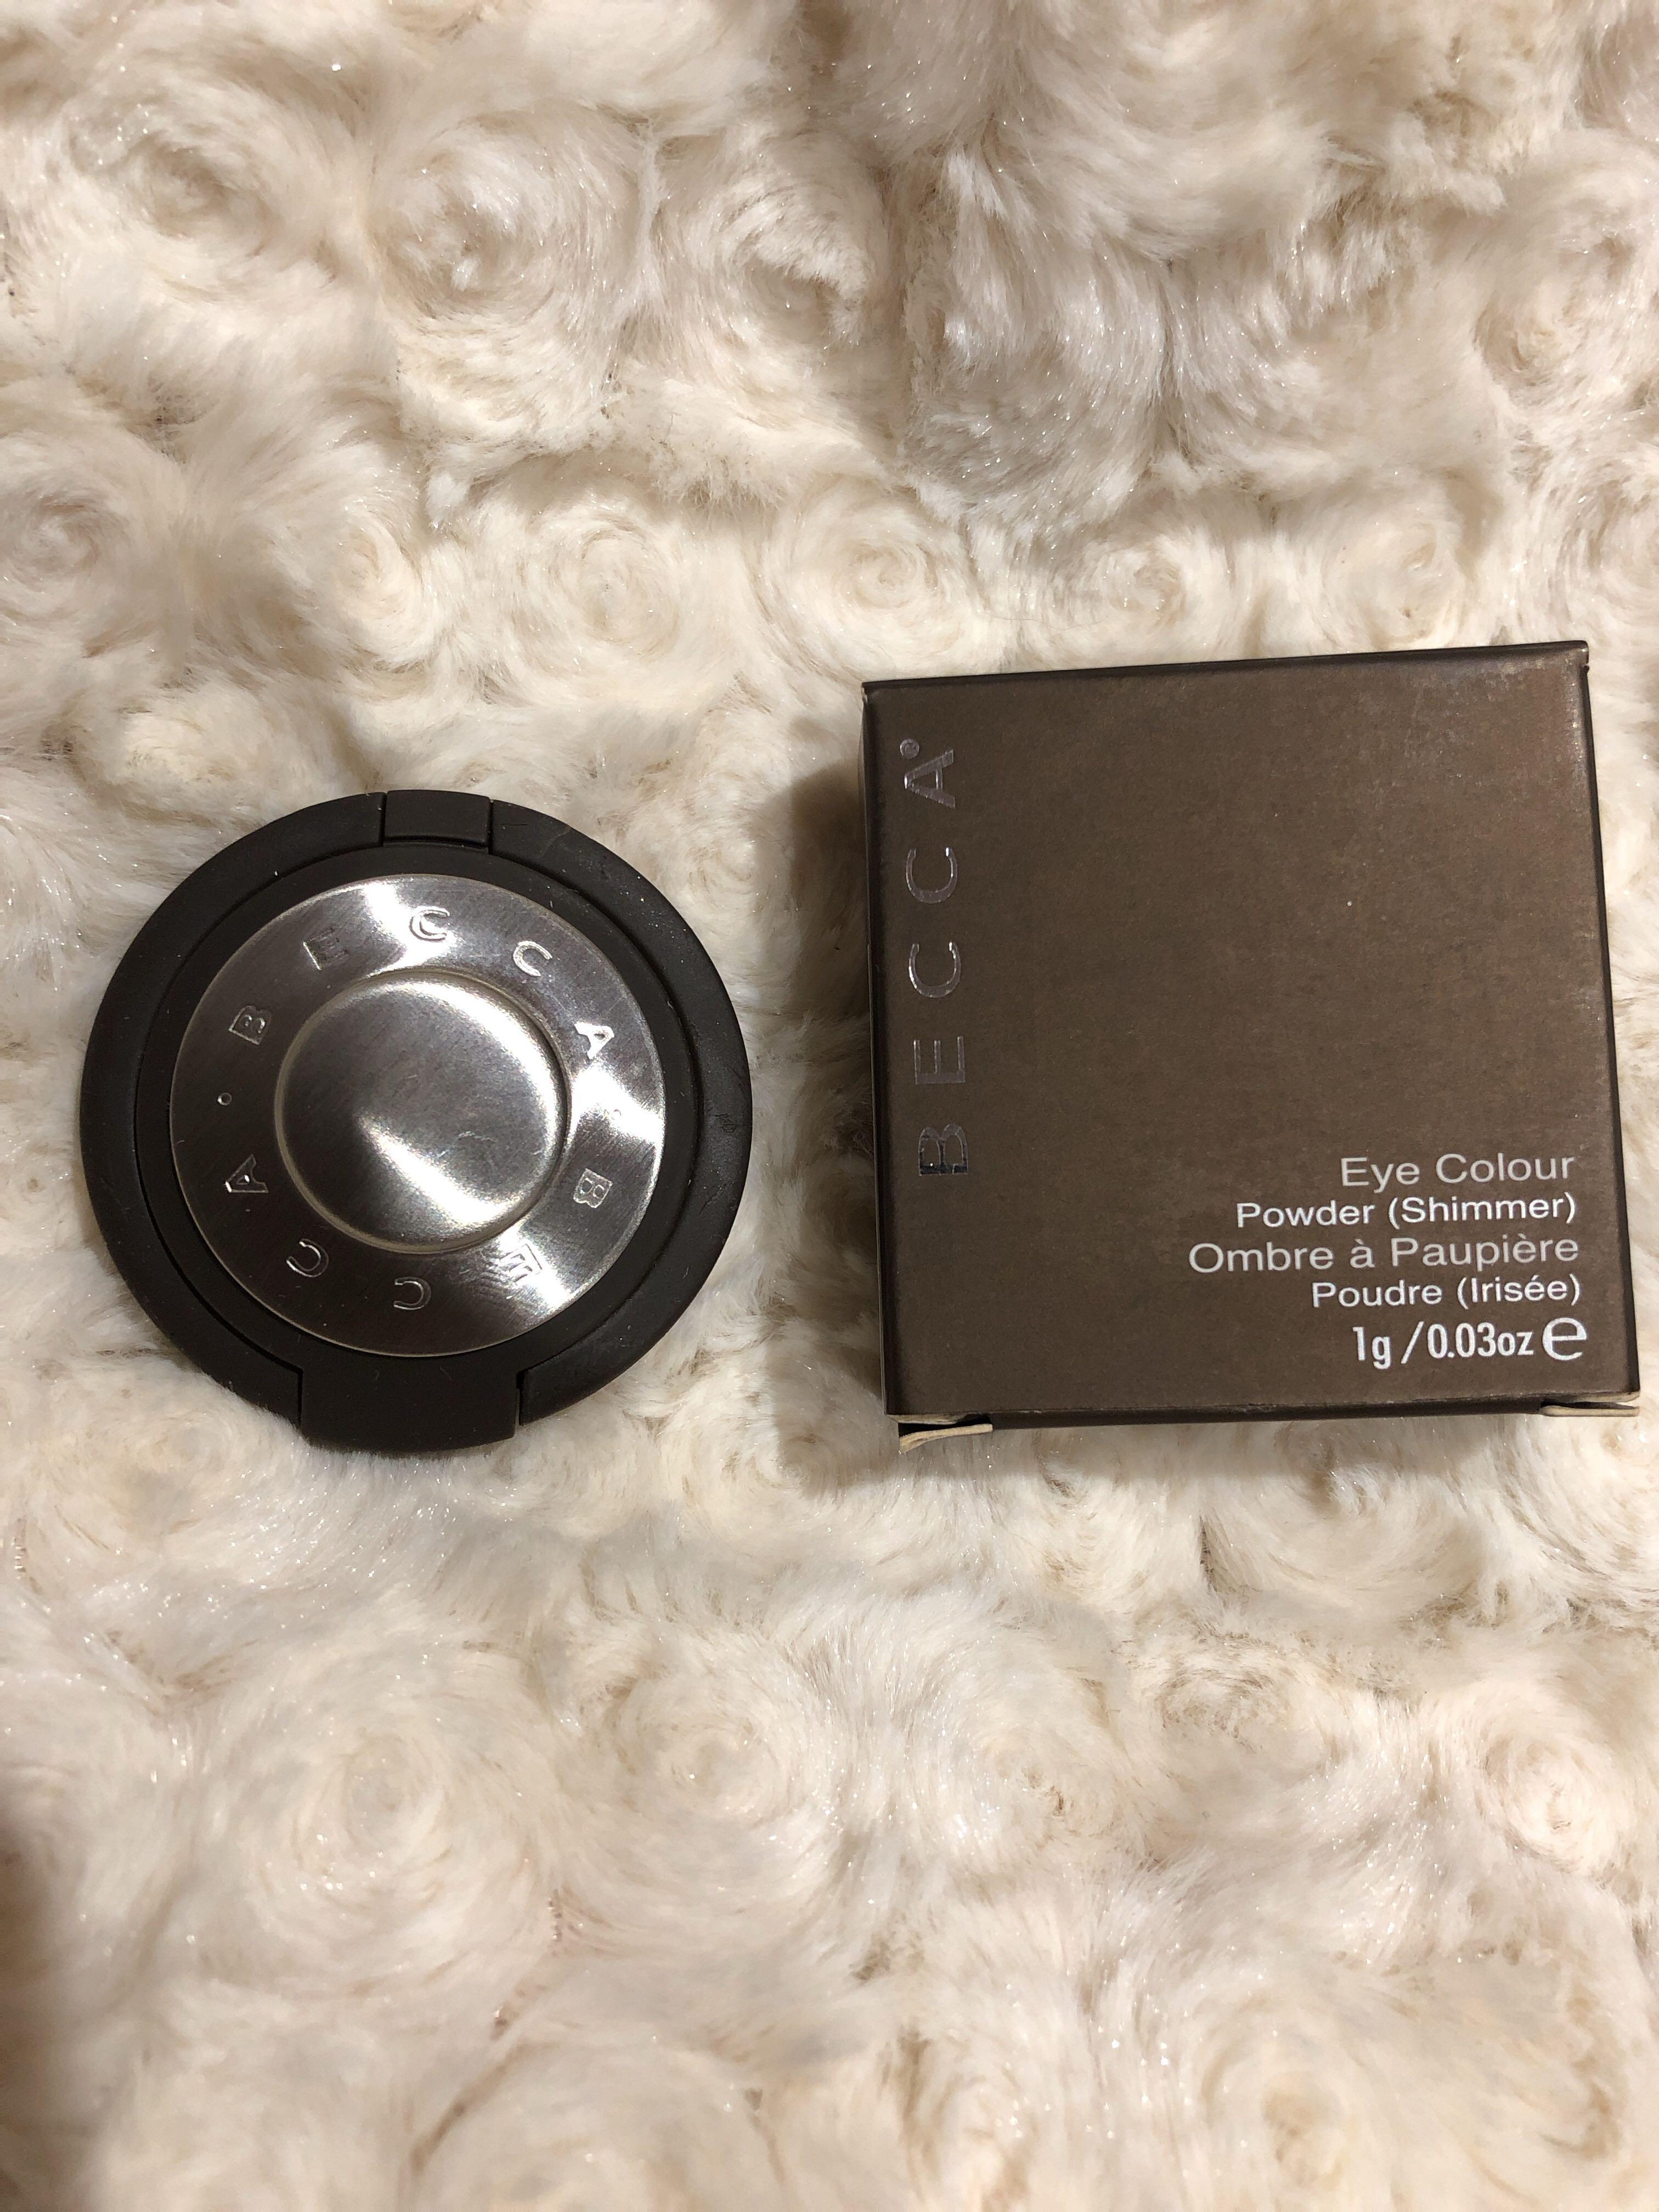 Becca Eye Colour Powder (Eyeshadow) Matte Shimmer Shantung